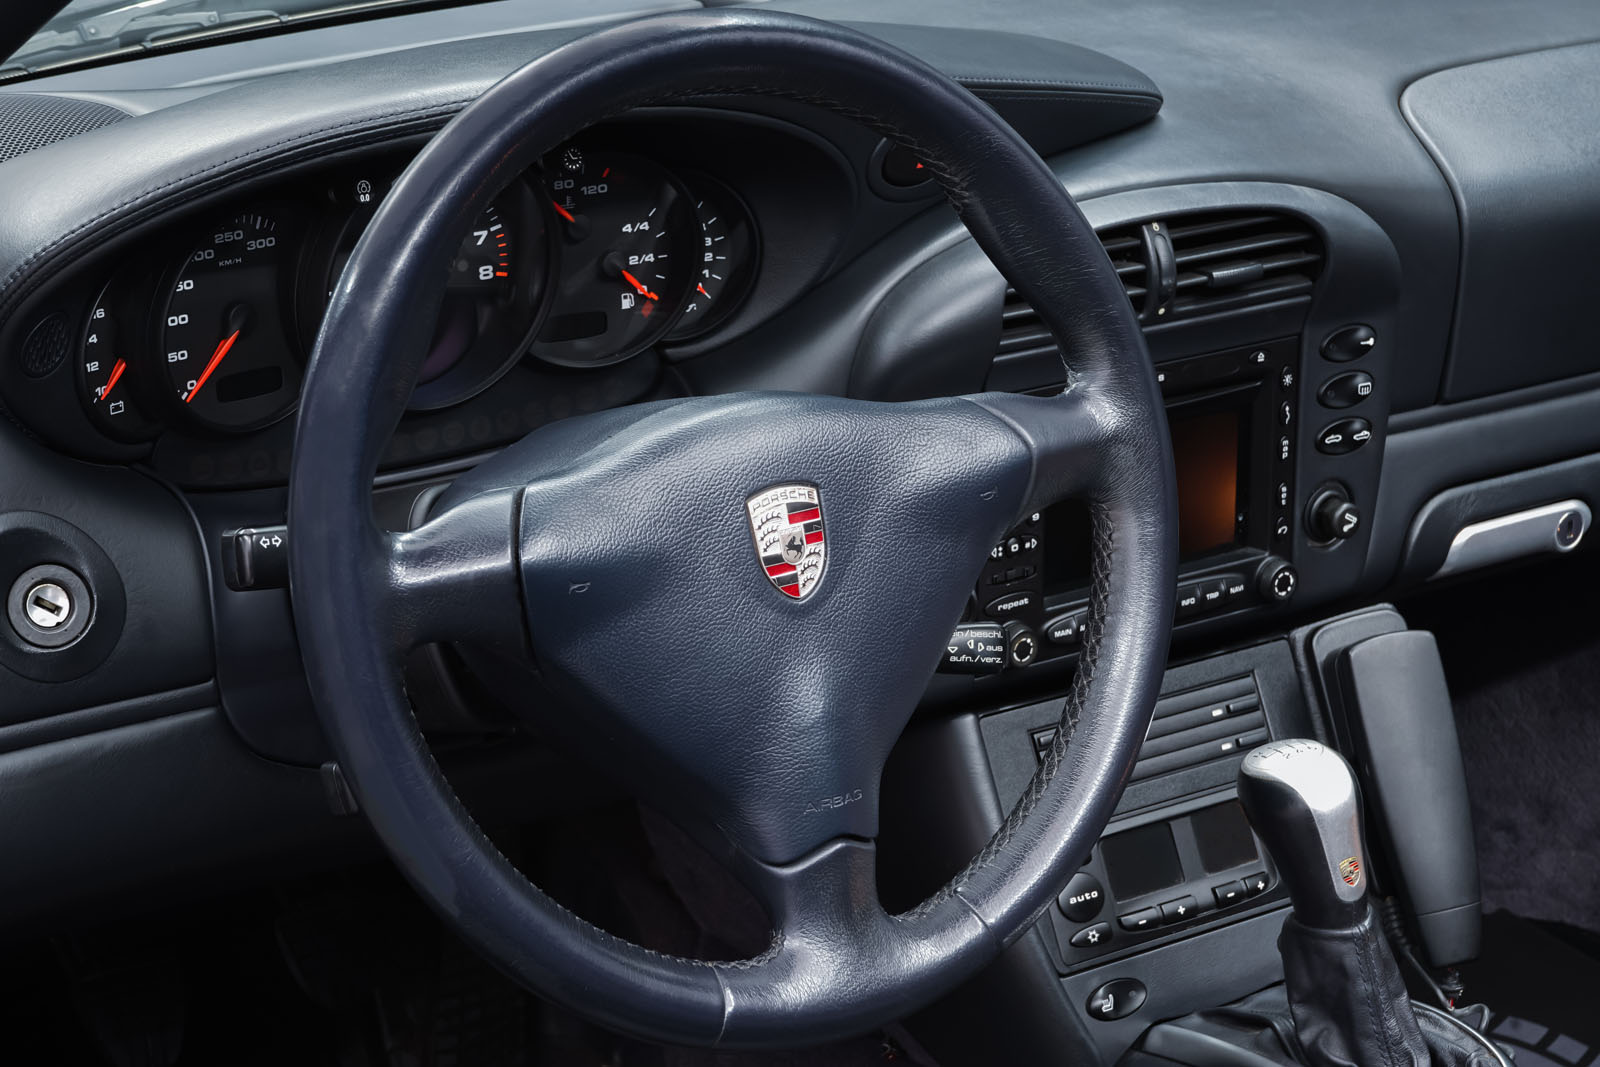 Porsche_996_Cabrio_Silber_Dunkelblau_POR-1724_11_w